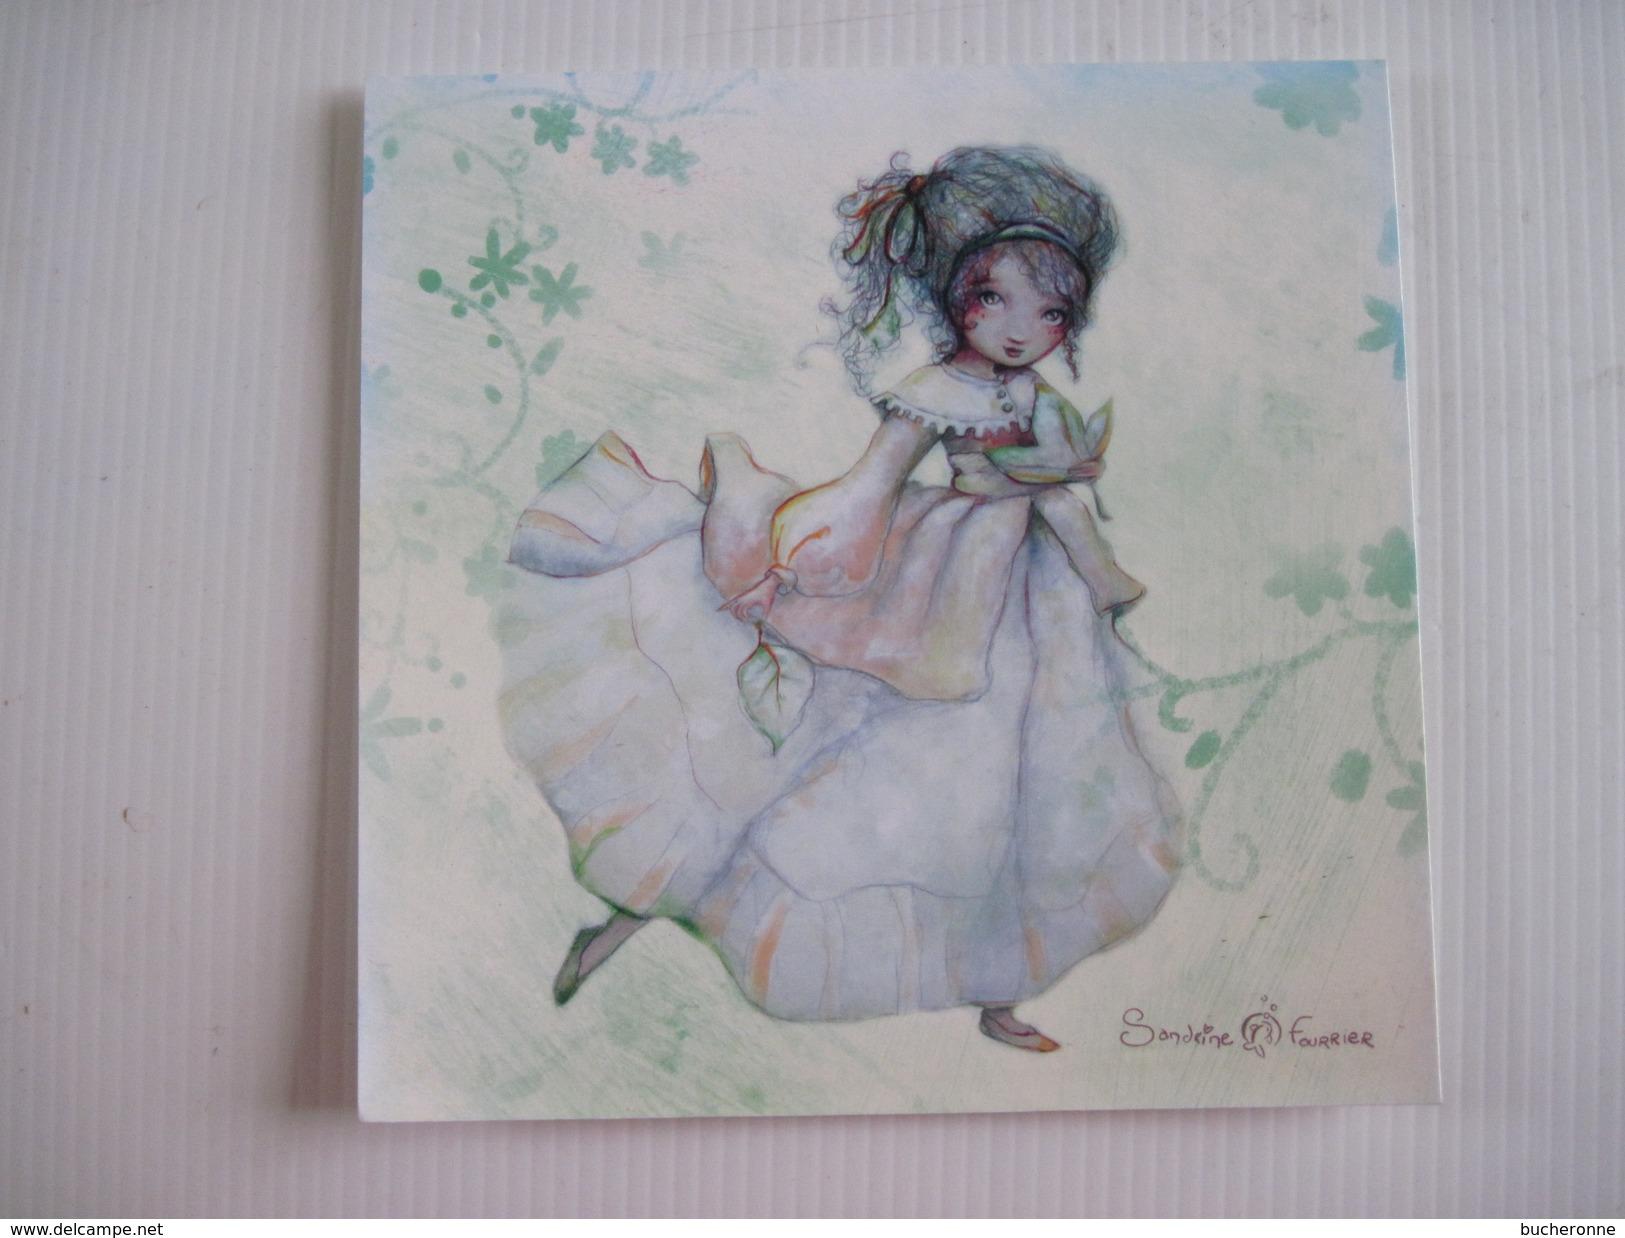 CPM Miss Automne Sandrine Fourrier T.B.E. 14 X 14 Cm - Illustratoren & Fotografen